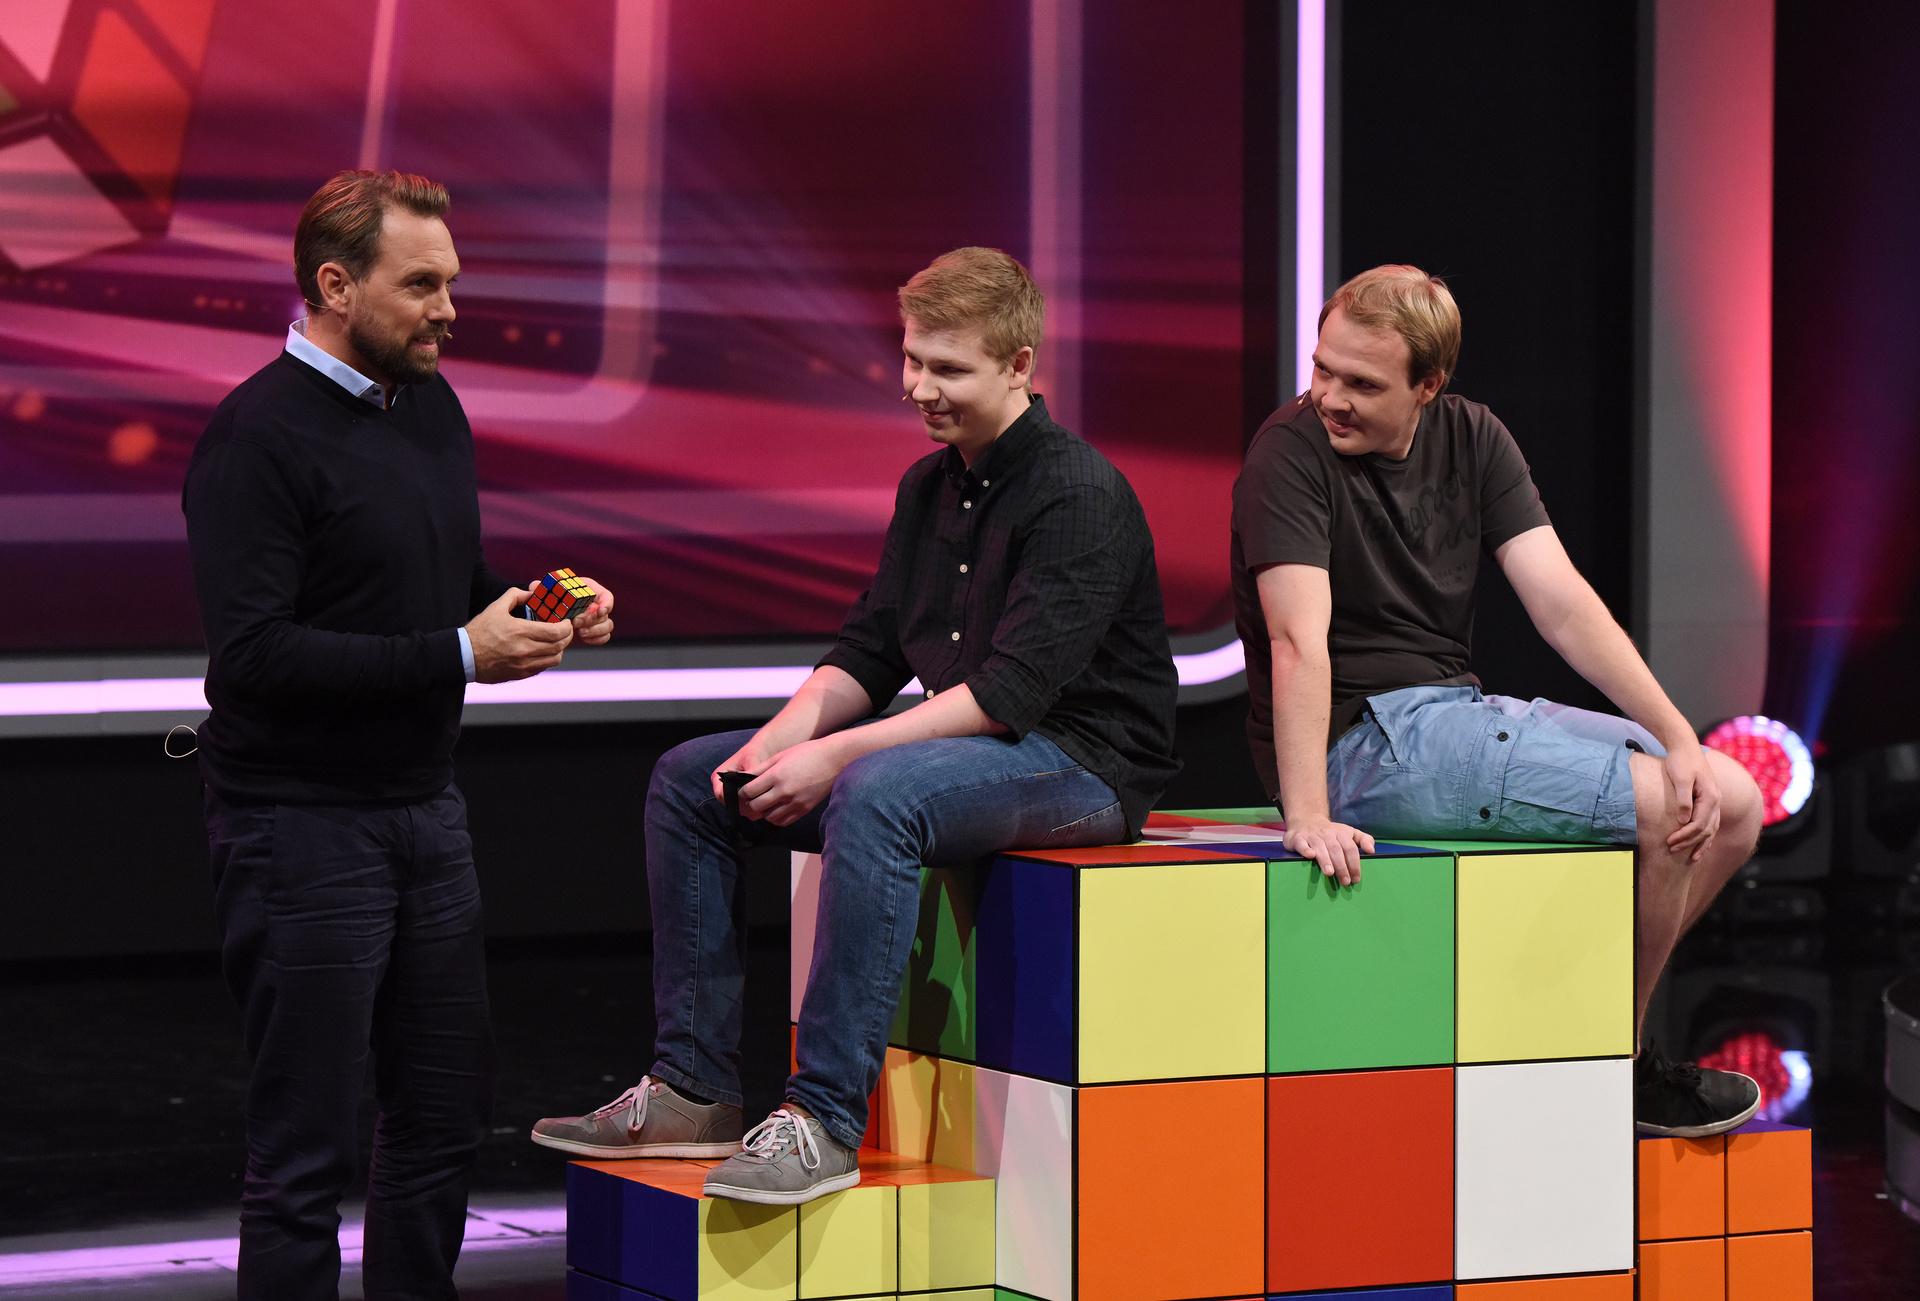 Deutschlands Superhirn 2016 - Jan Bentlage, Philipp Weyer und Steven Gätjen